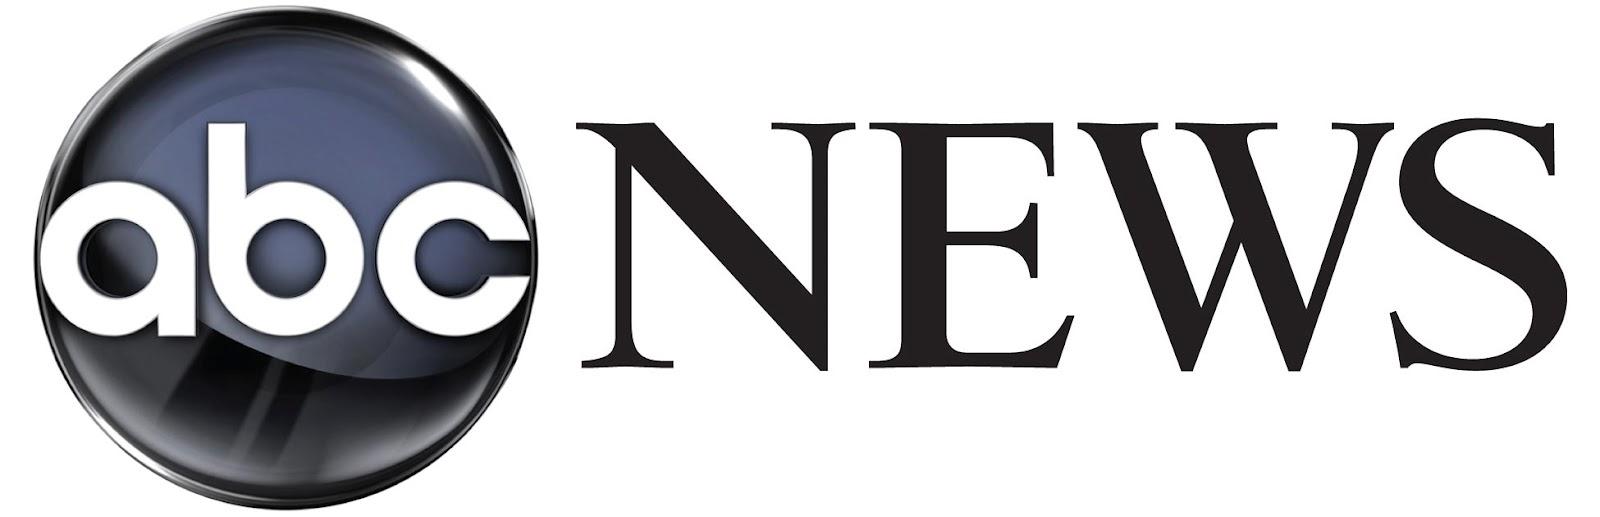 kite-site-abc-news-logo-large